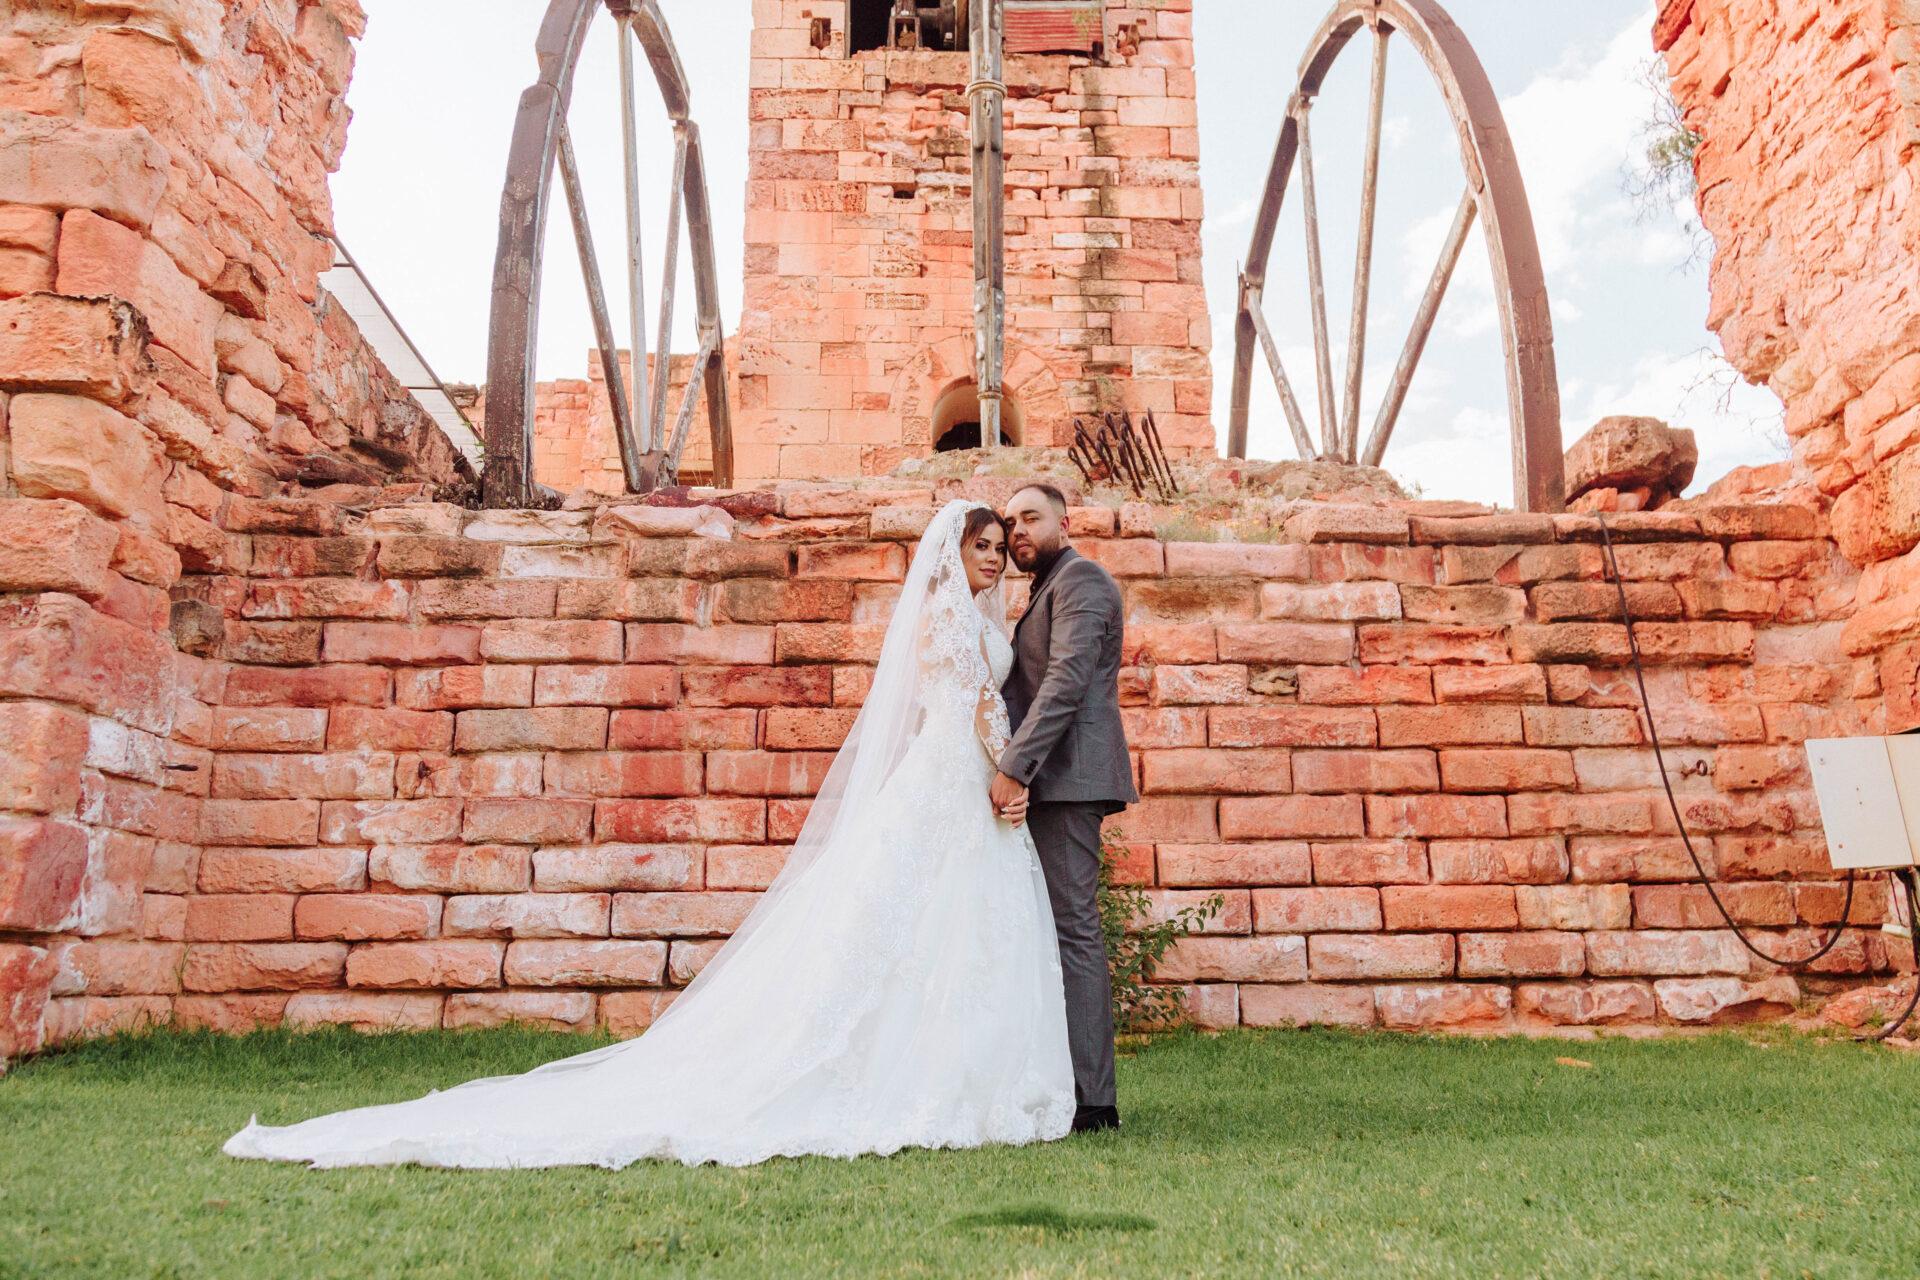 javier_noriega_fotografo_bodas_zacatecas_fresnillo_chihuahua_wedding_photographer17